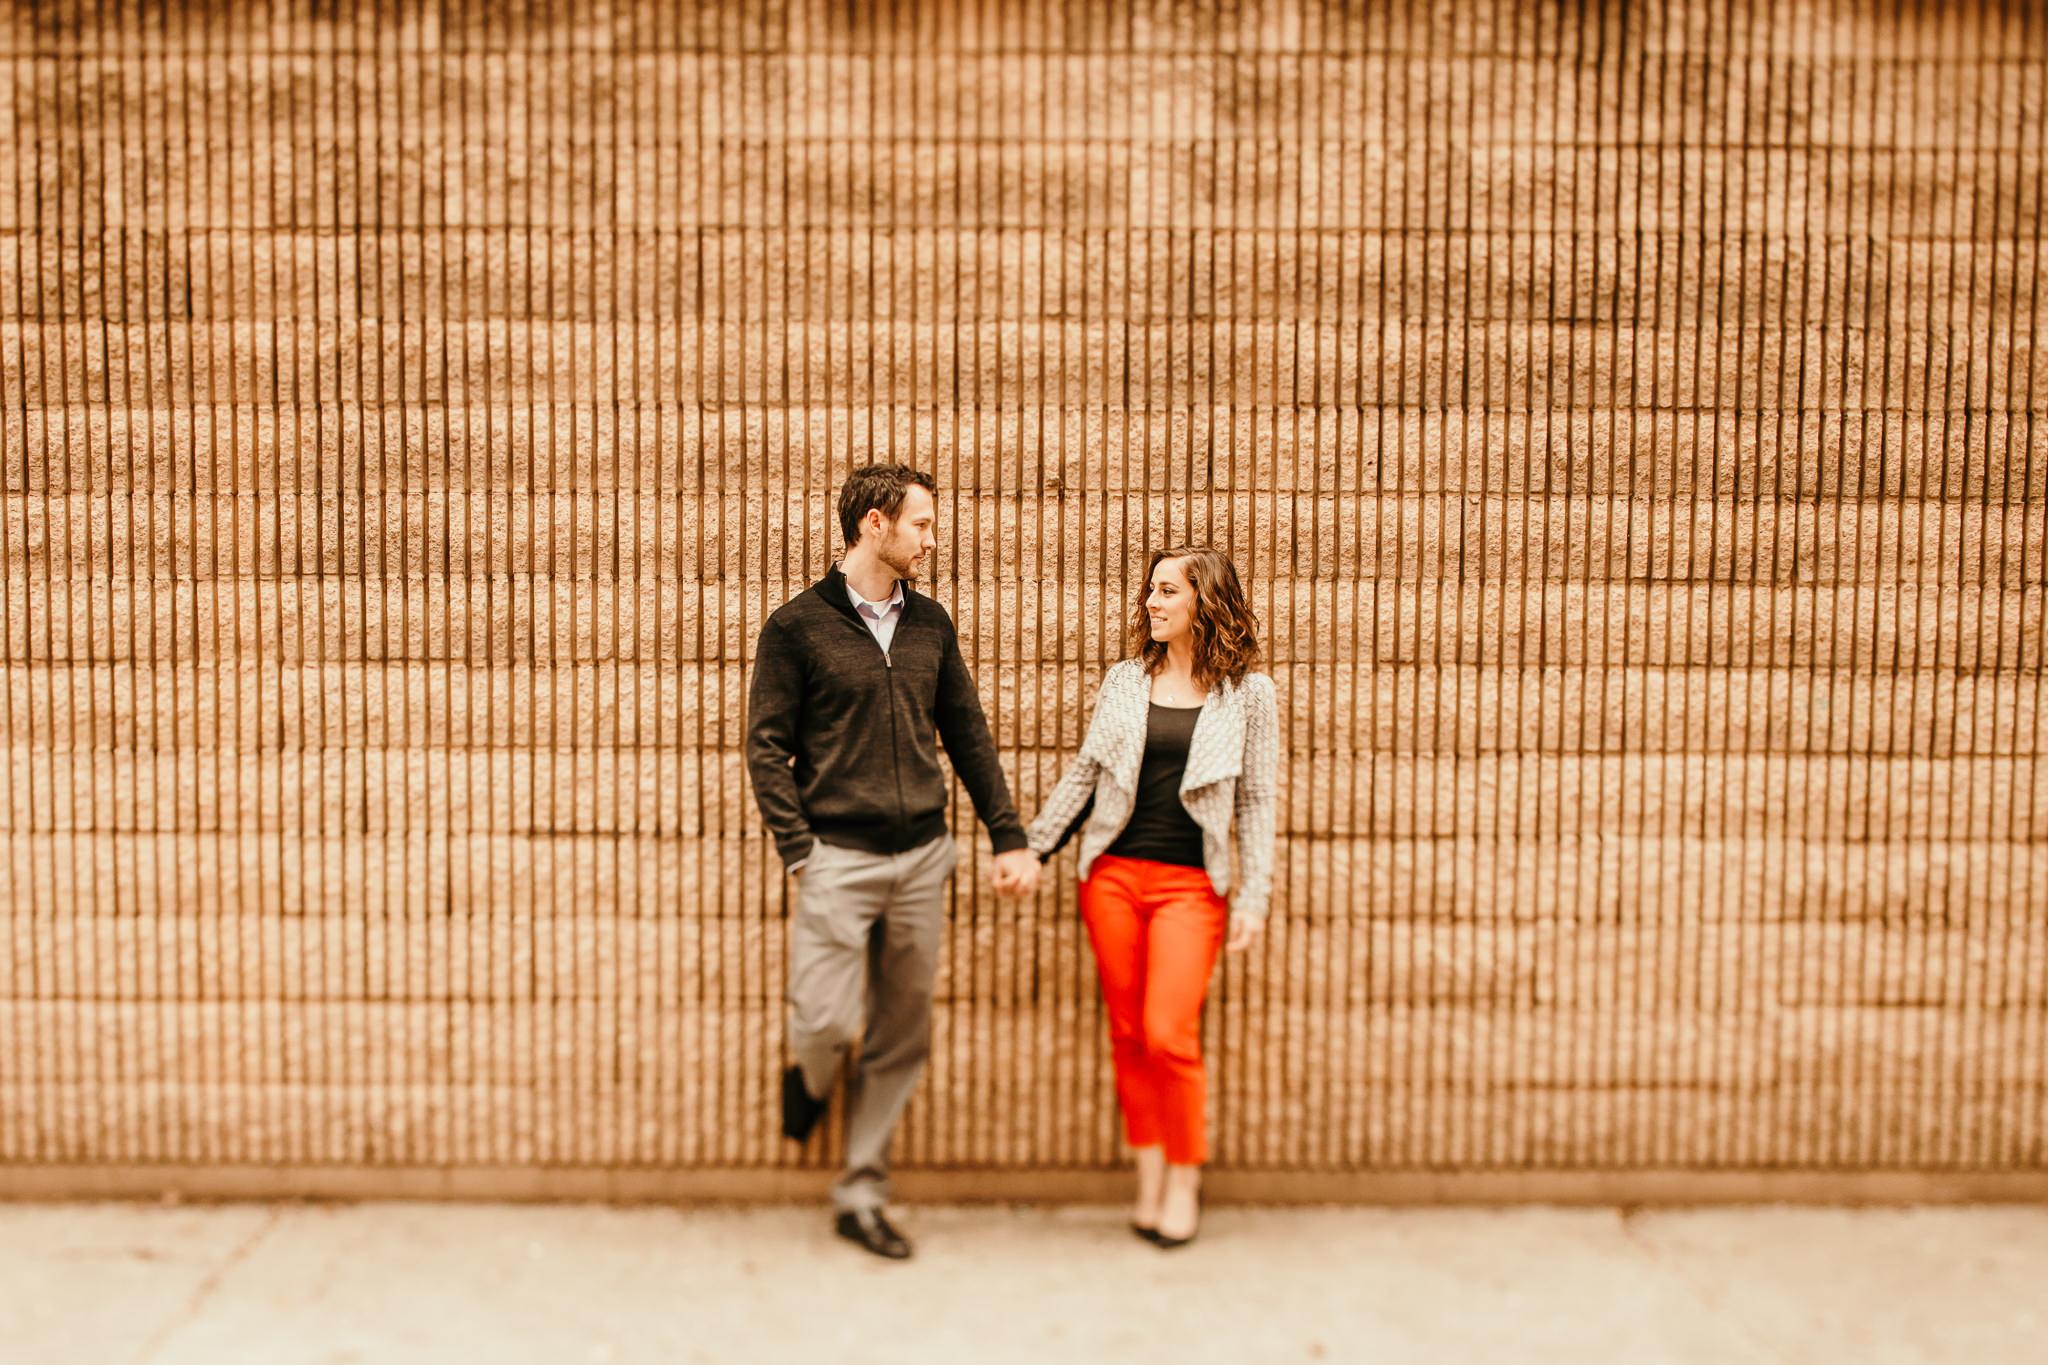 Engagement - Downtown Roanoke - Virginia - Wedding Photographer - Pat Cori Photography-41.jpg